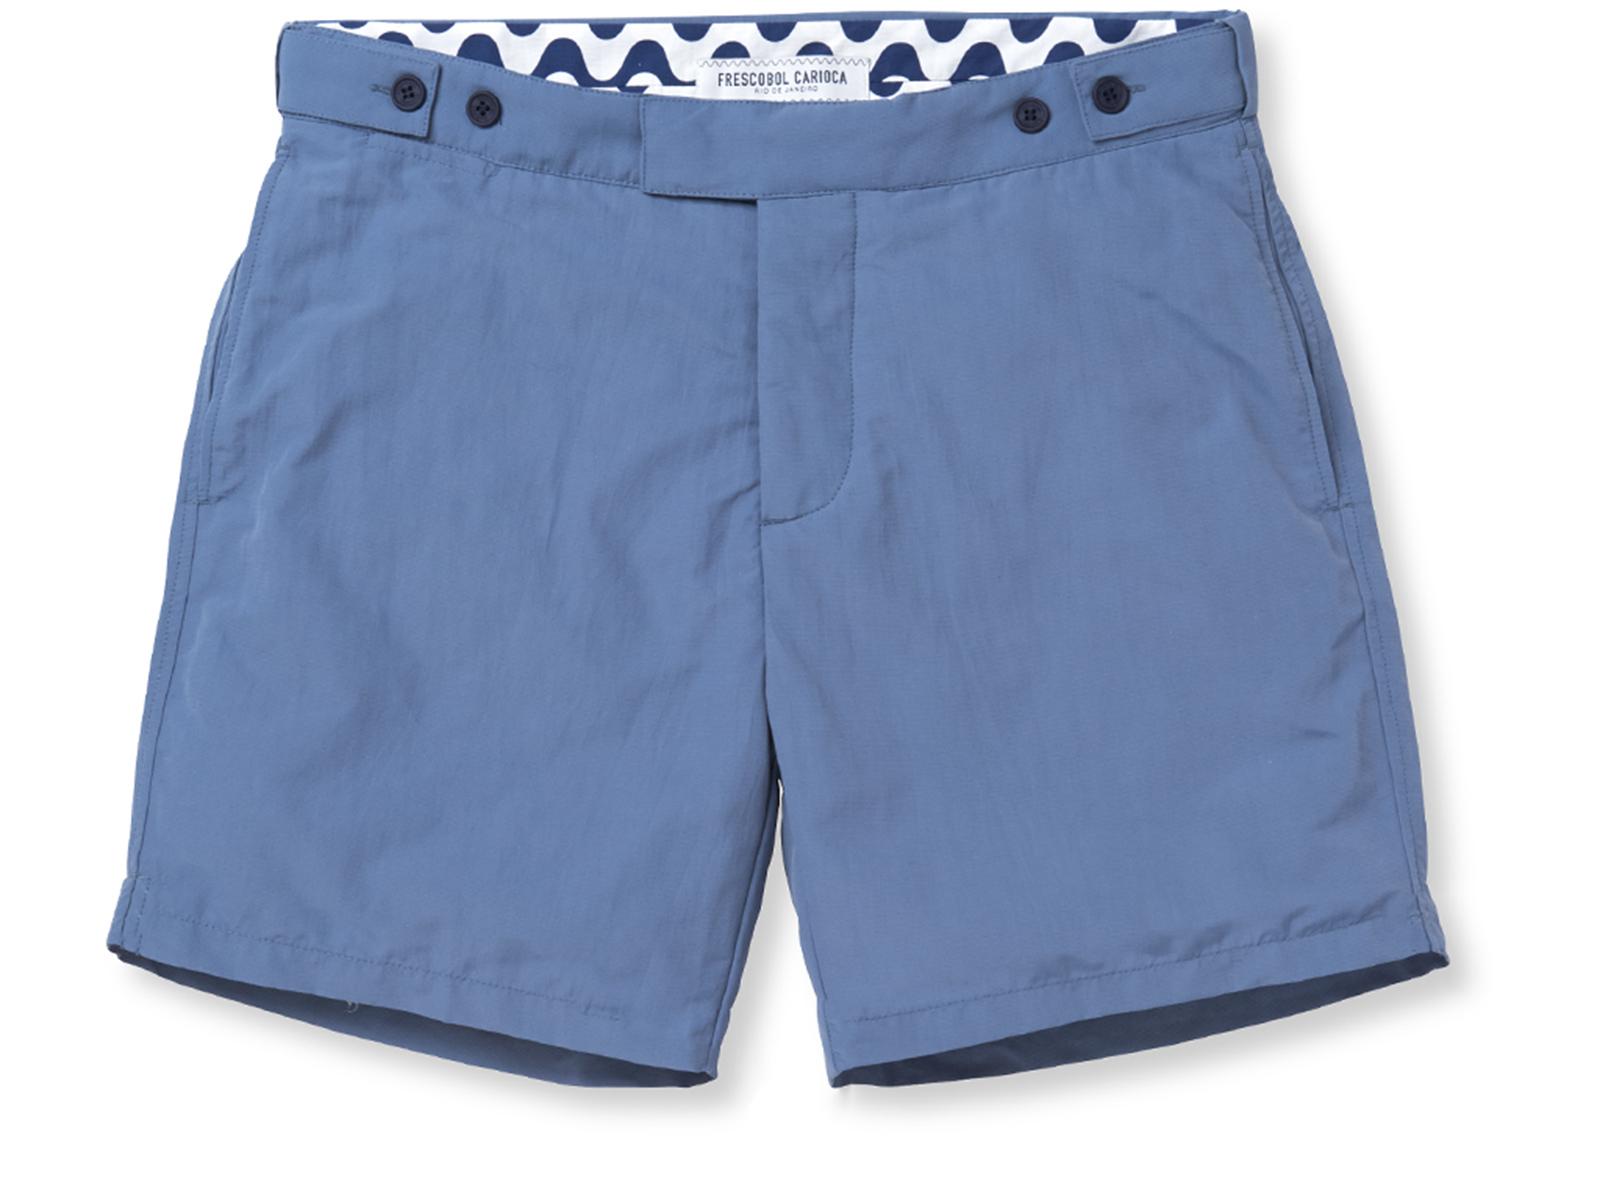 0b42685879 Swim Shorts Slim Fit Mens` Shorts In Blue - Block Tailored Short Slate